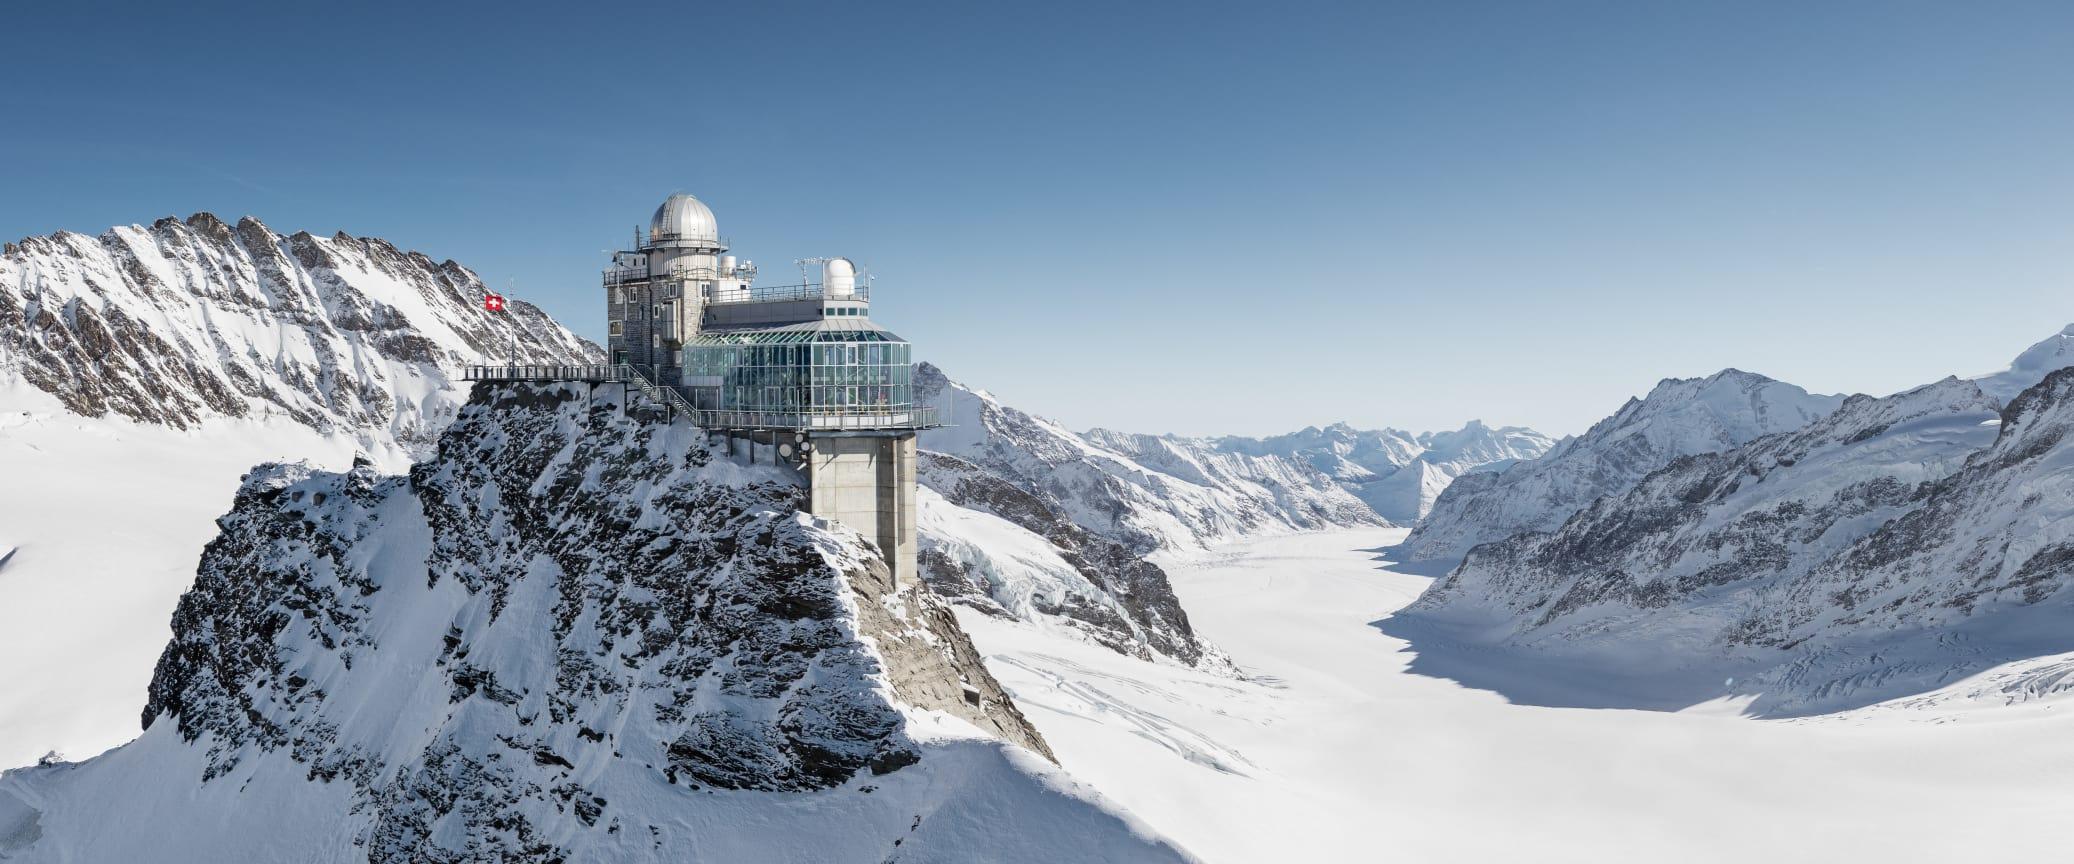 Jungfraujoch-Sphinx-Gletscher.jpg